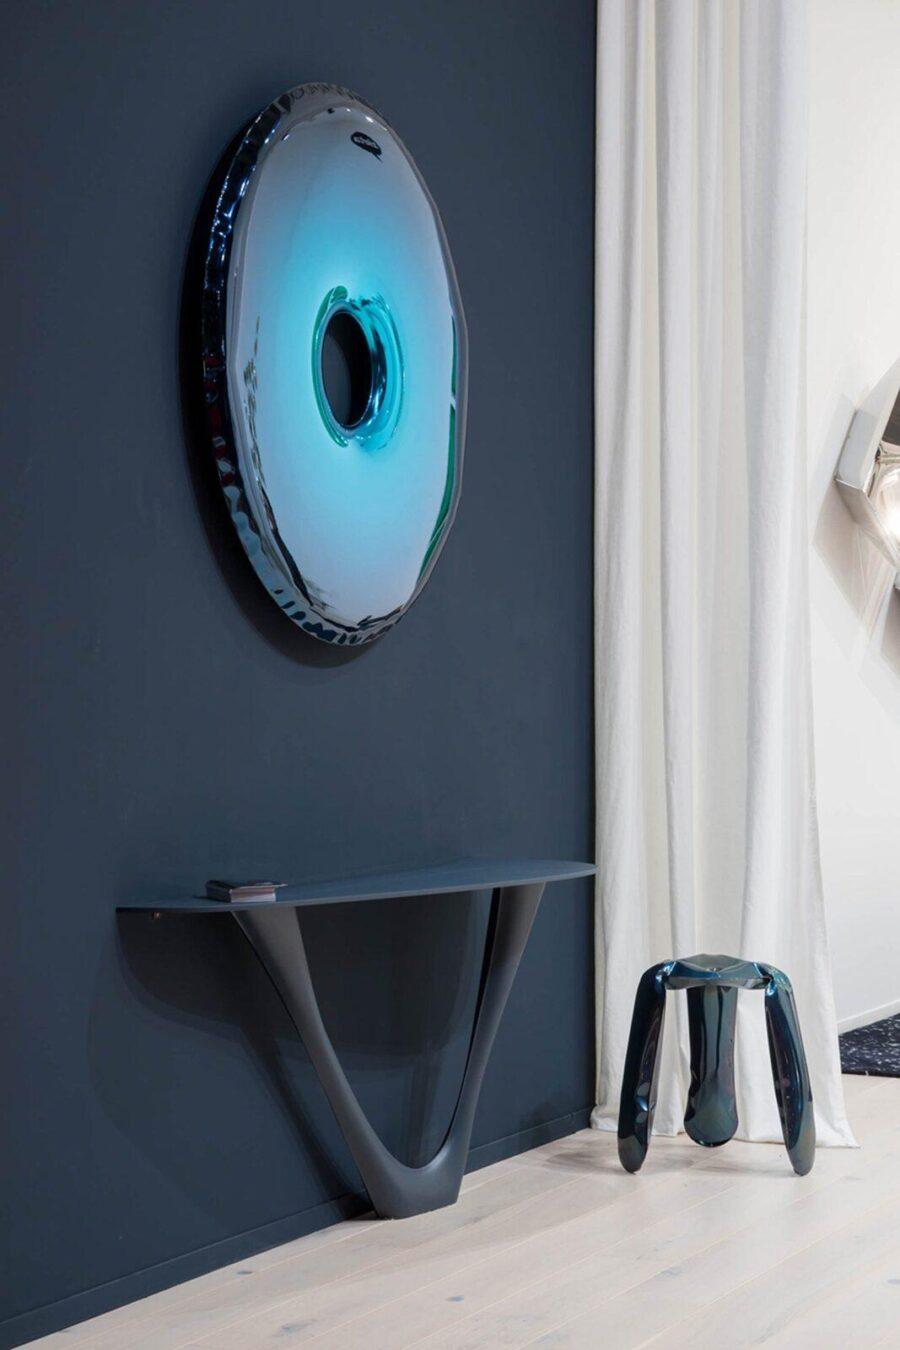 rondo mirror deep space blue g-console mono plopp